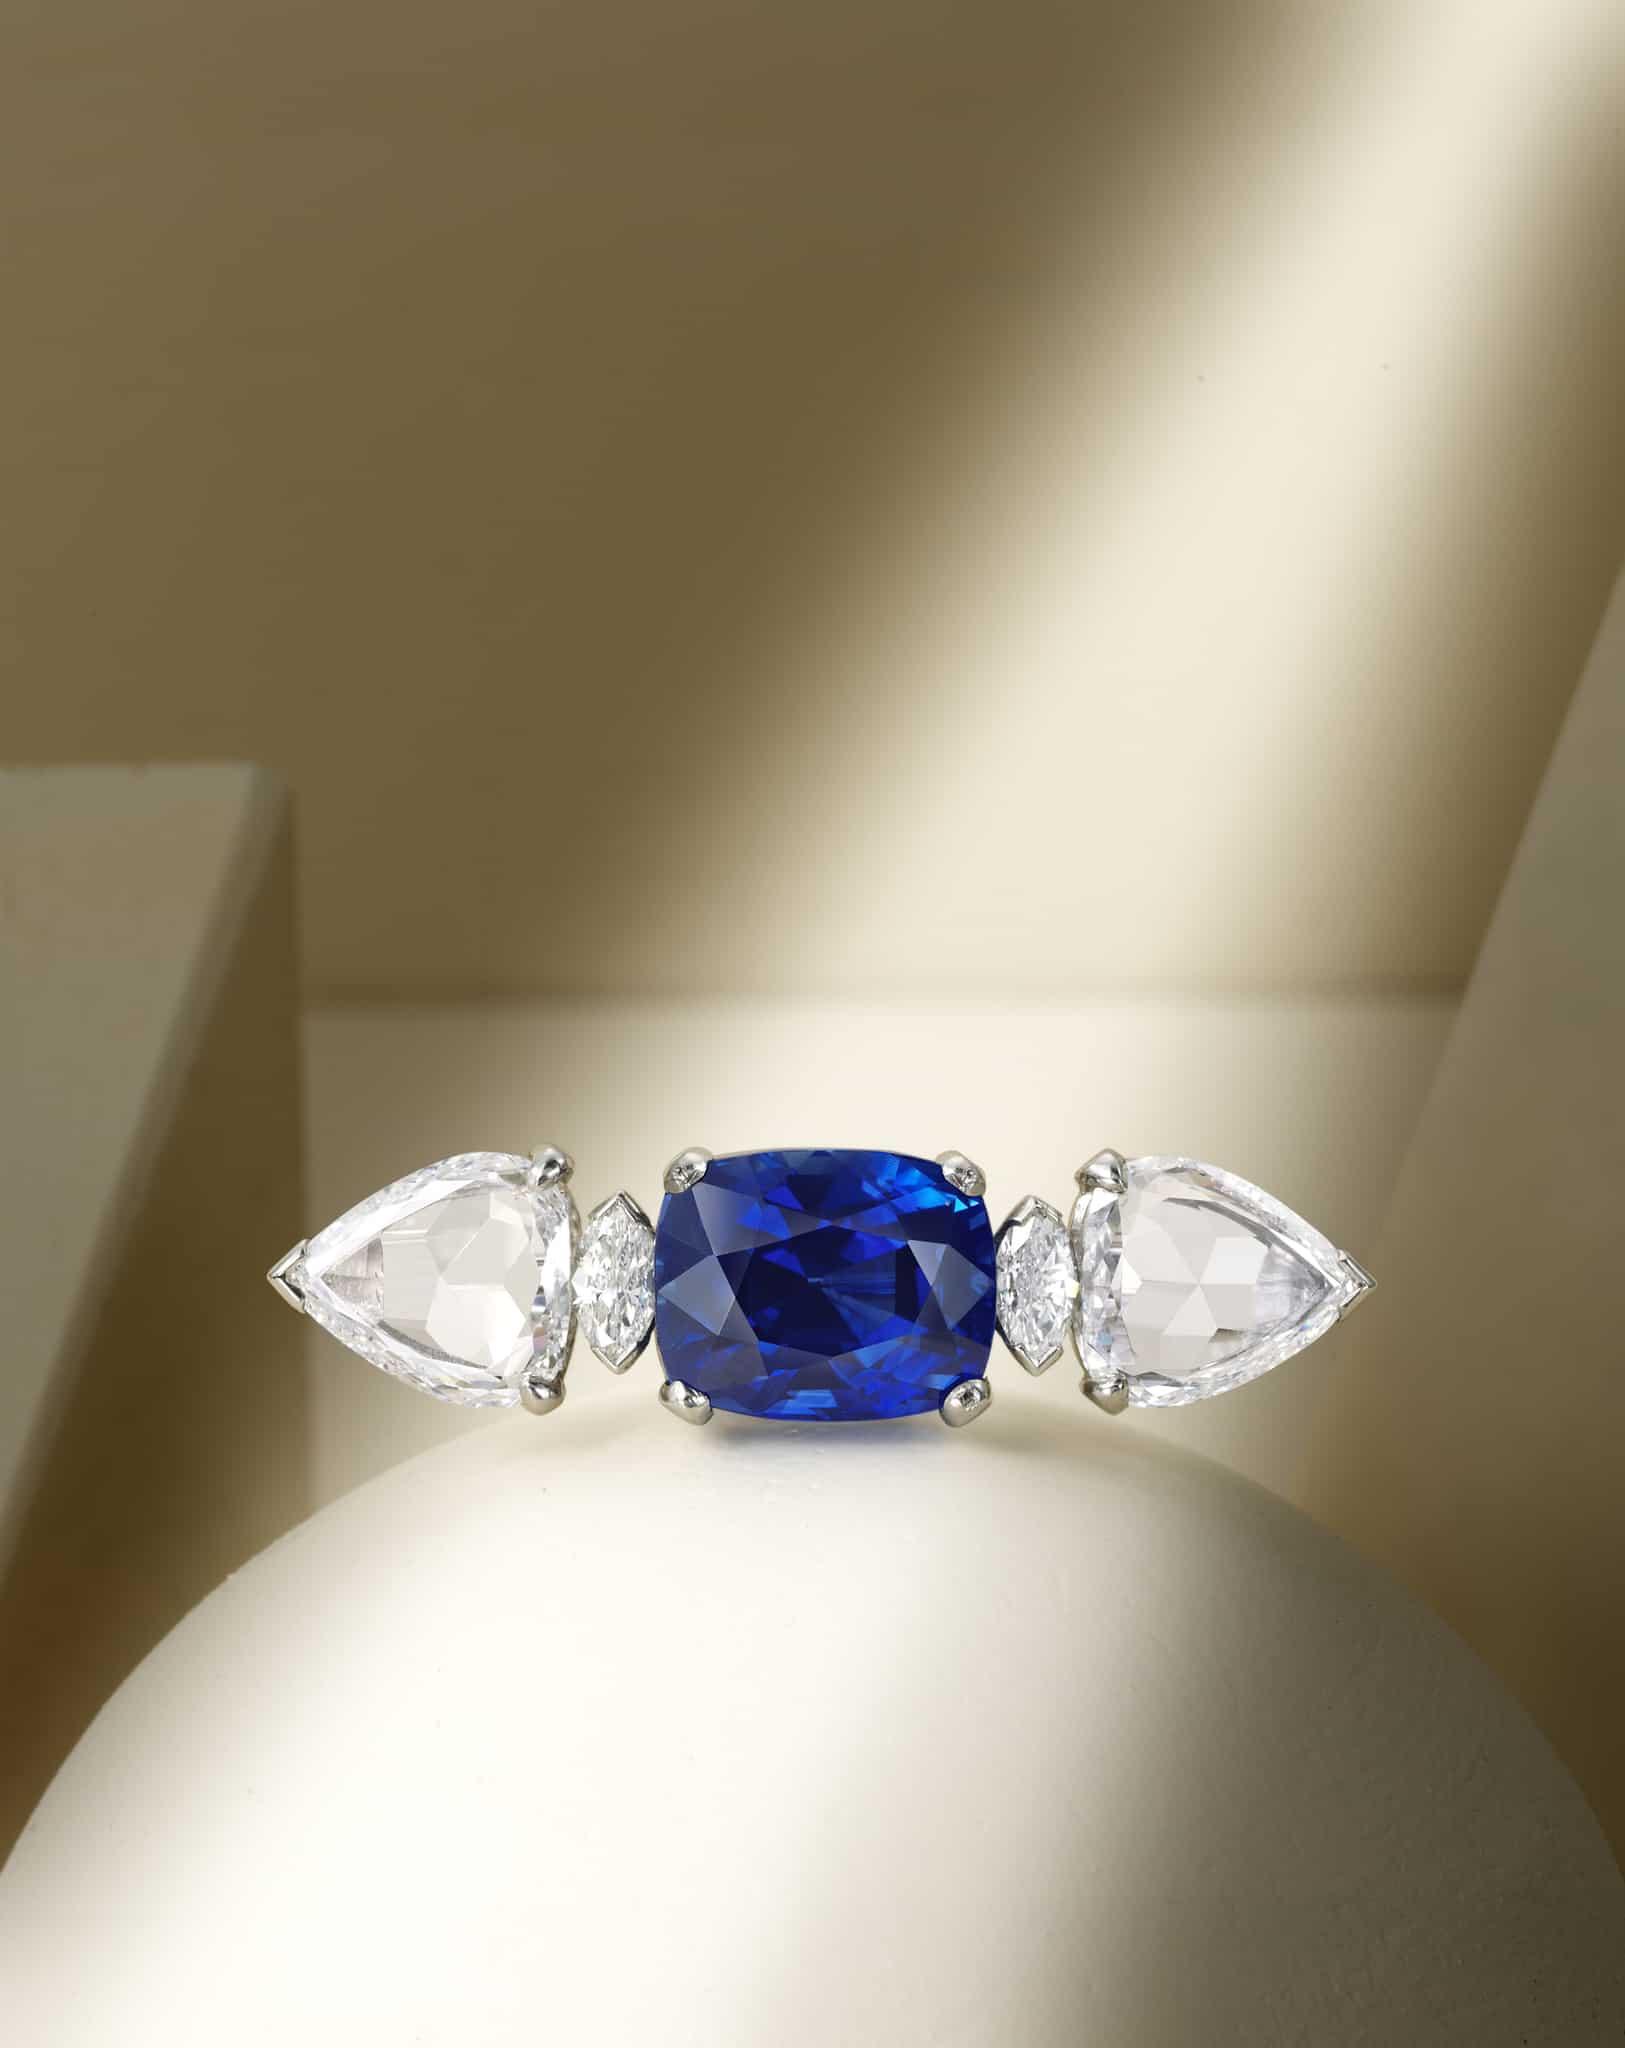 Kashmir Sapphire with Historic American Provenance leads Bonhams New York Jewels Sale